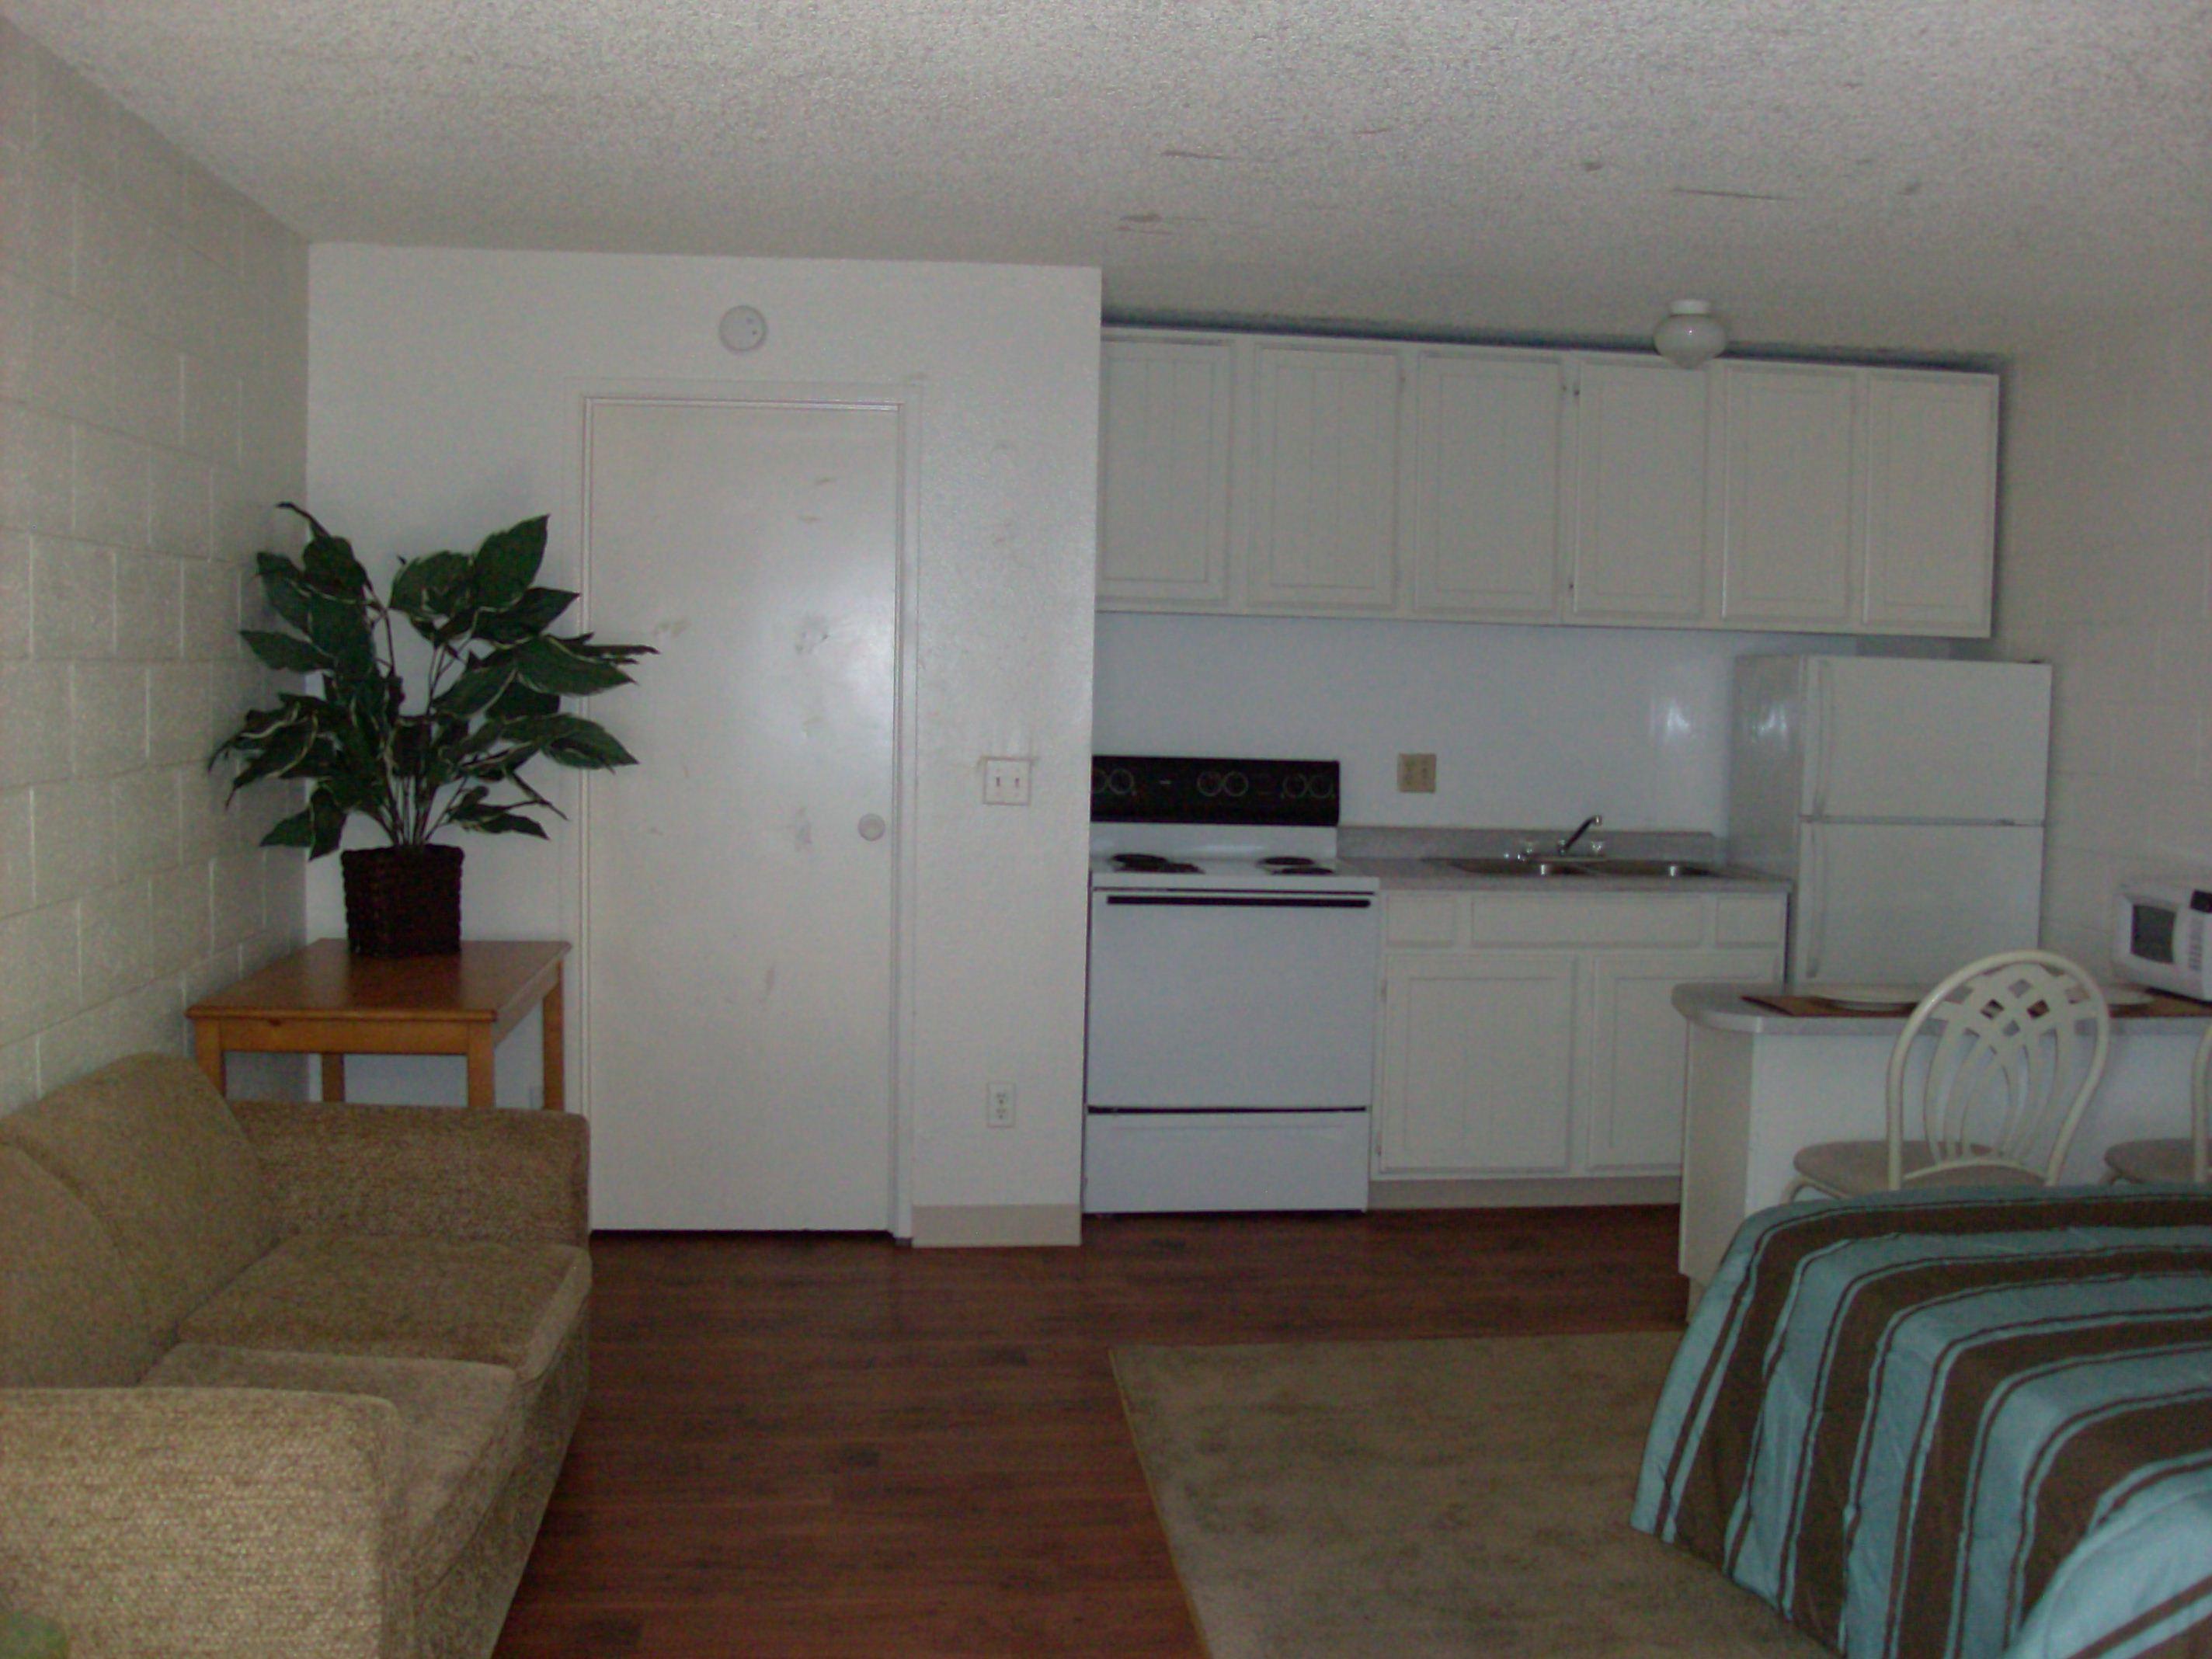 cottage grove apartments 965 cottage grove ave las vegas nv 89119 rh yellowpages com the cottages apartments las vegas nv